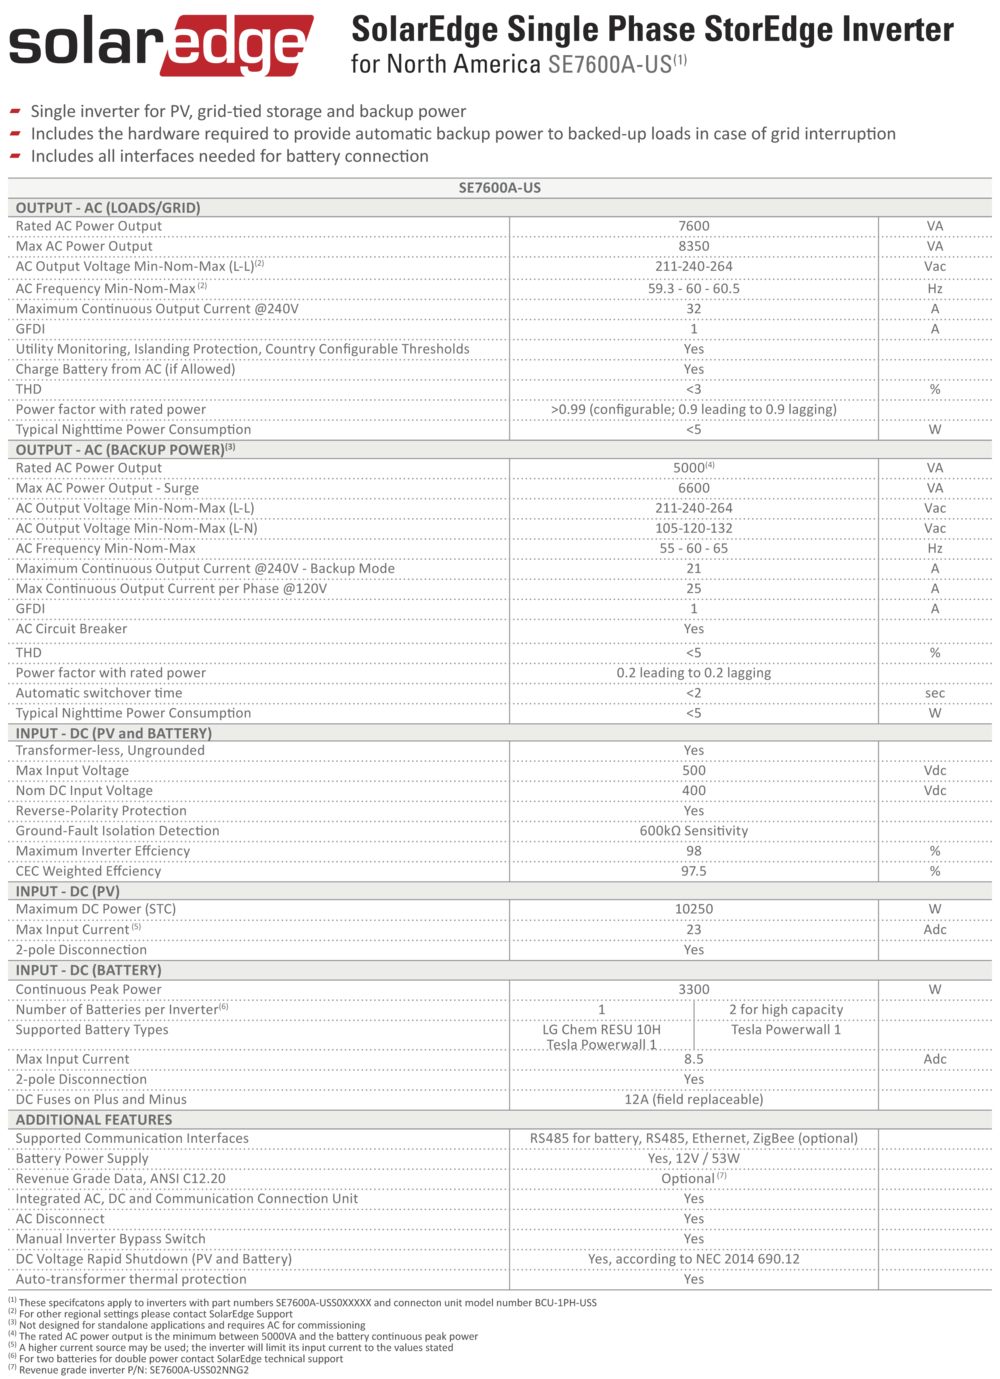 se_storedge_inverter_datasheet_na-3.png